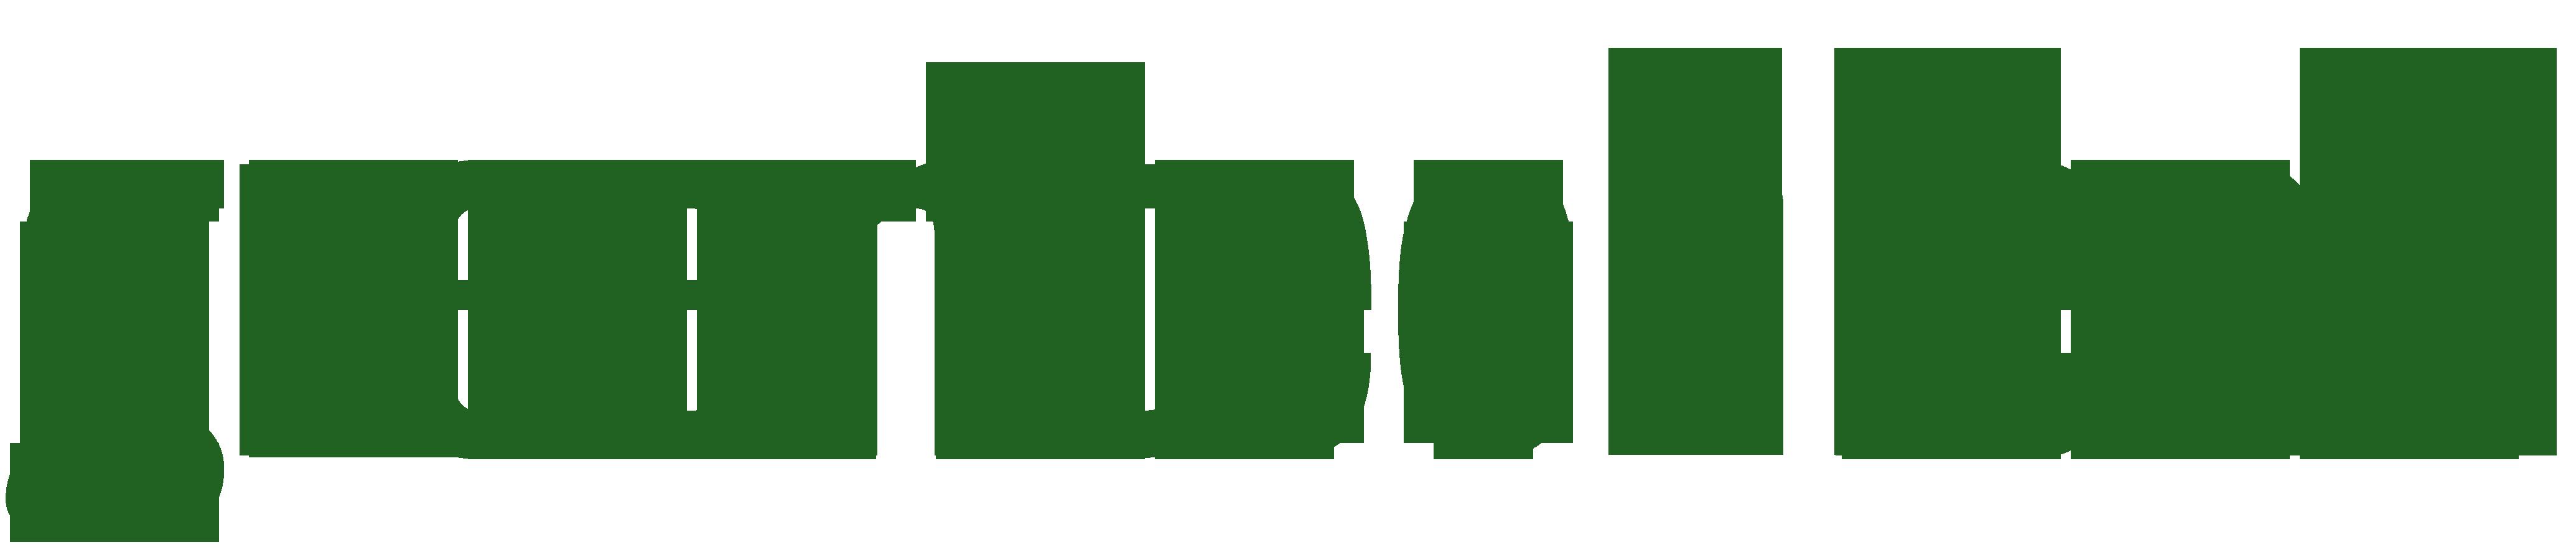 GreentechLead